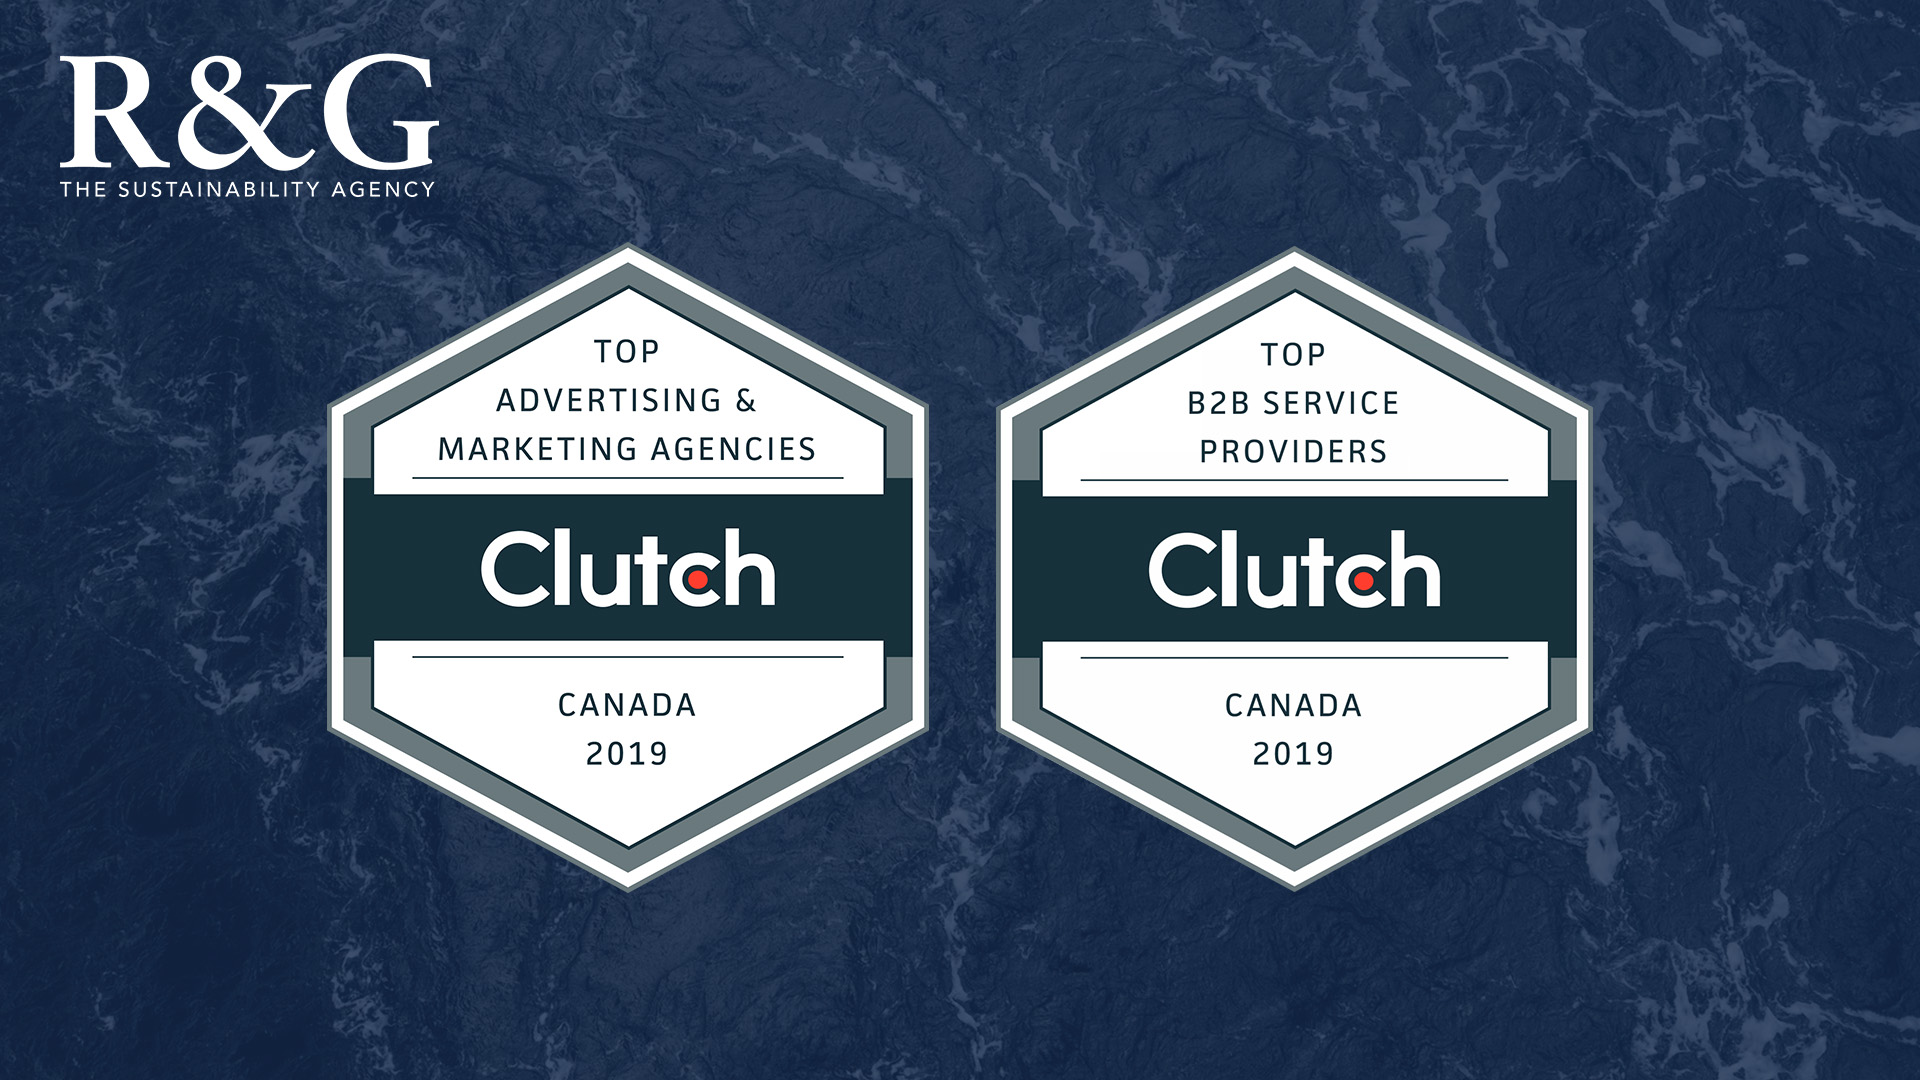 R&G Clutch Marketing Awards